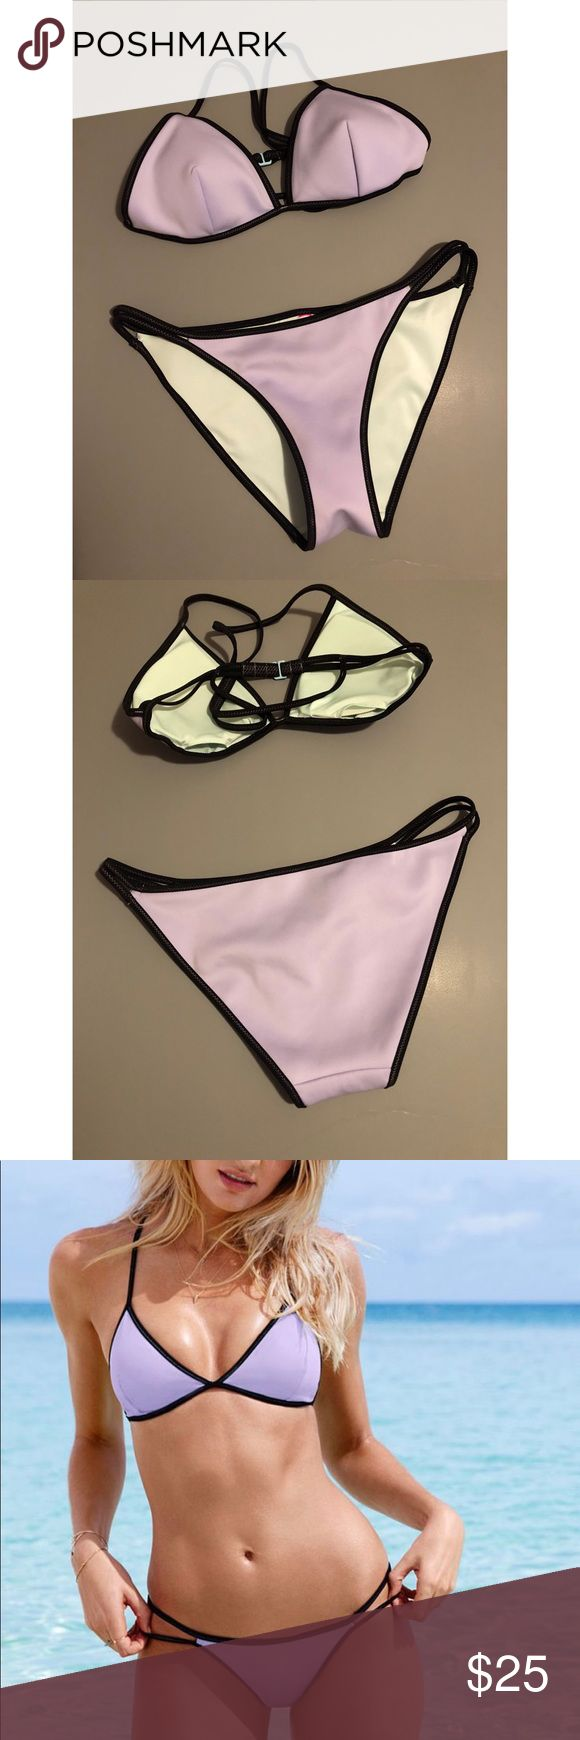 Victoria's Secret Purple Triangle Bikini Victoria's Secret Triangle Bikini with matching purple bottom. Size M (top and bottom)  *Been worn once Victoria's Secret Swim Bikinis